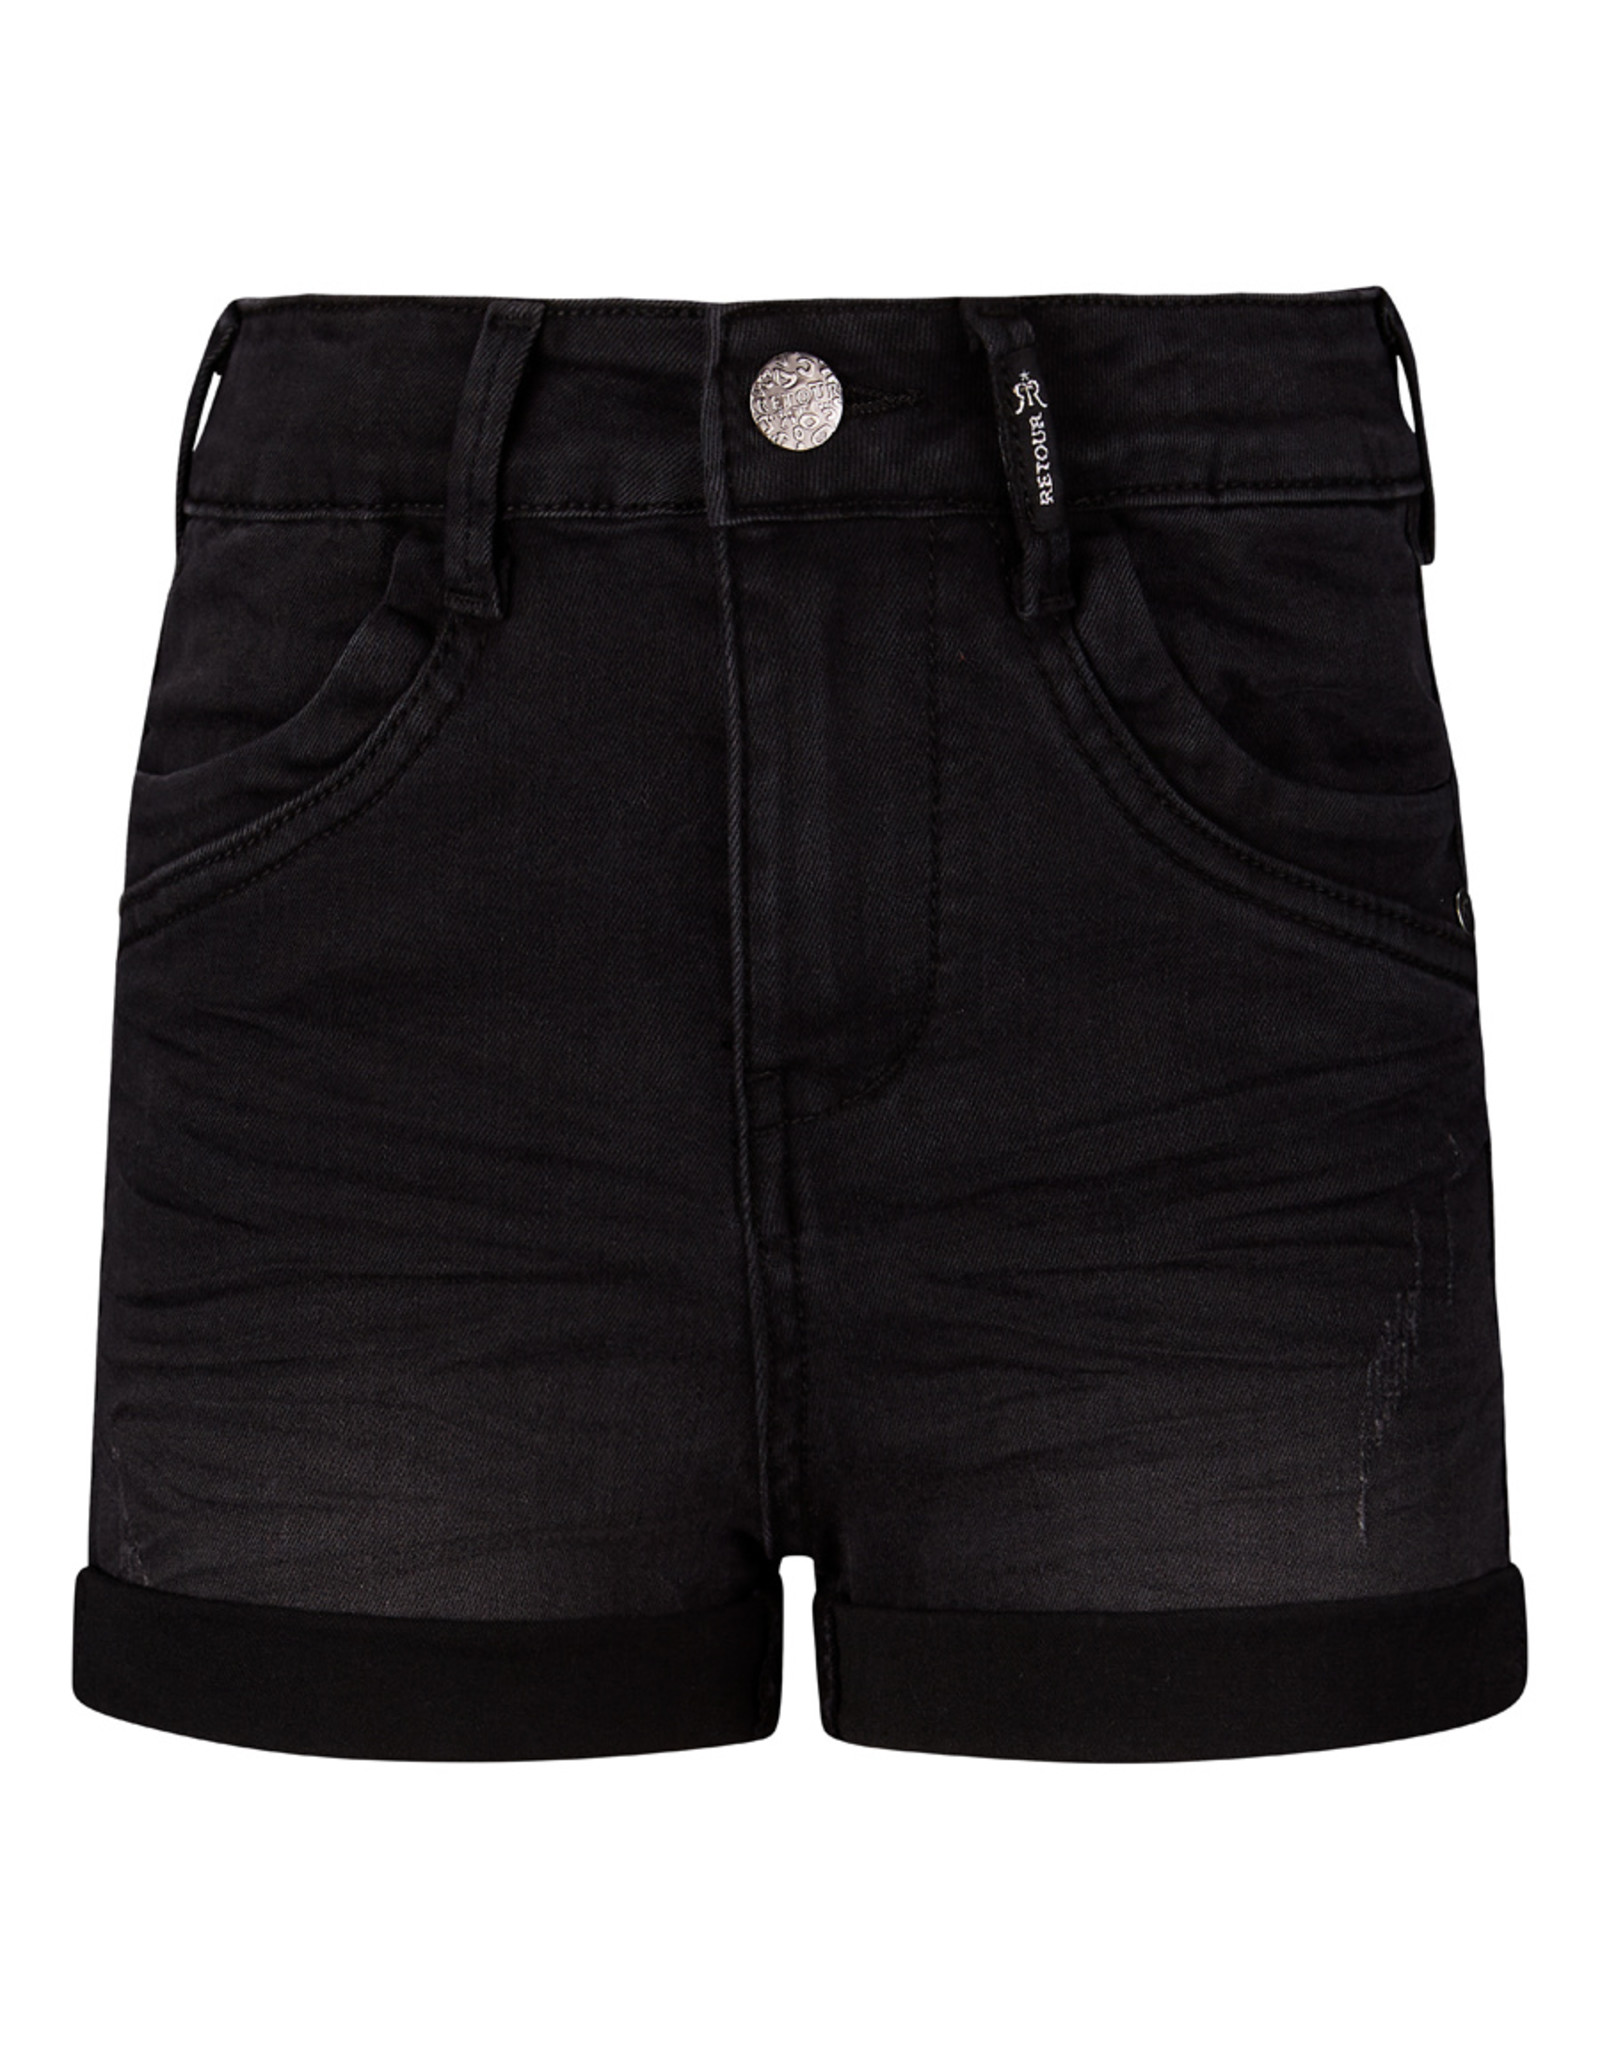 Retour Jeans Short Iliyah Vintage Black Denim